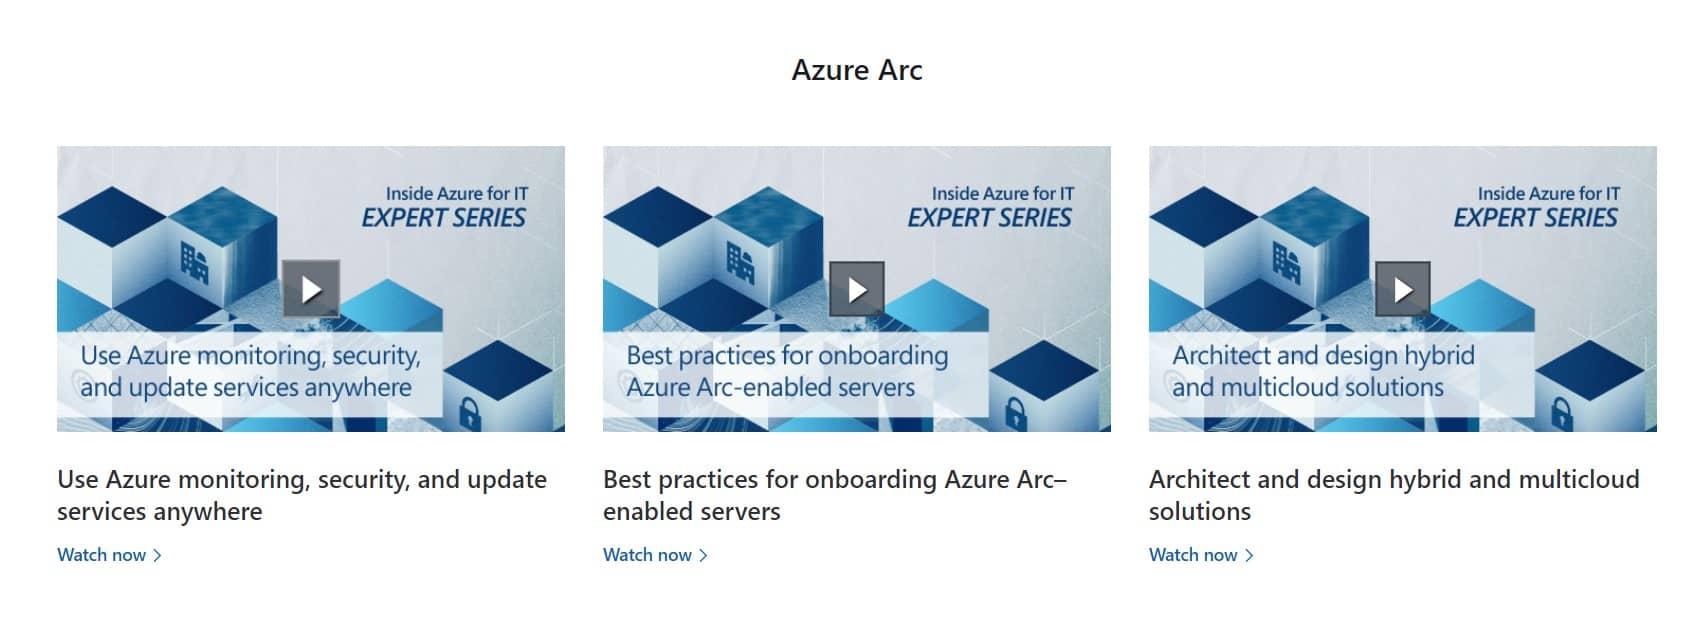 Inside Azure for IT Azure Arc